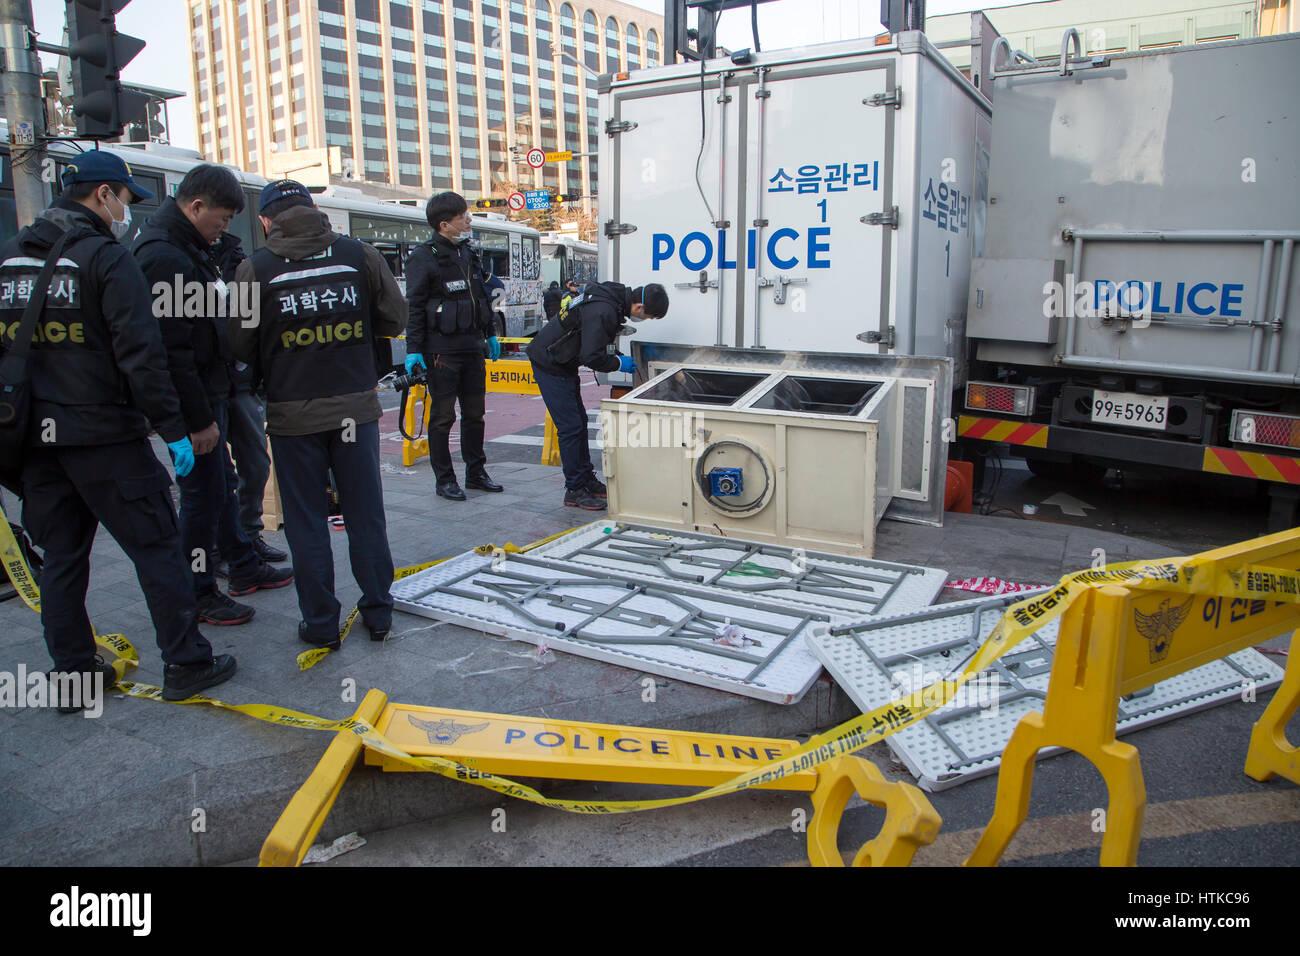 South Korea Politics, Mar 10, 2017 : Policemen from the Korea Crime Scene Investigation identify on a spot where - Stock Image